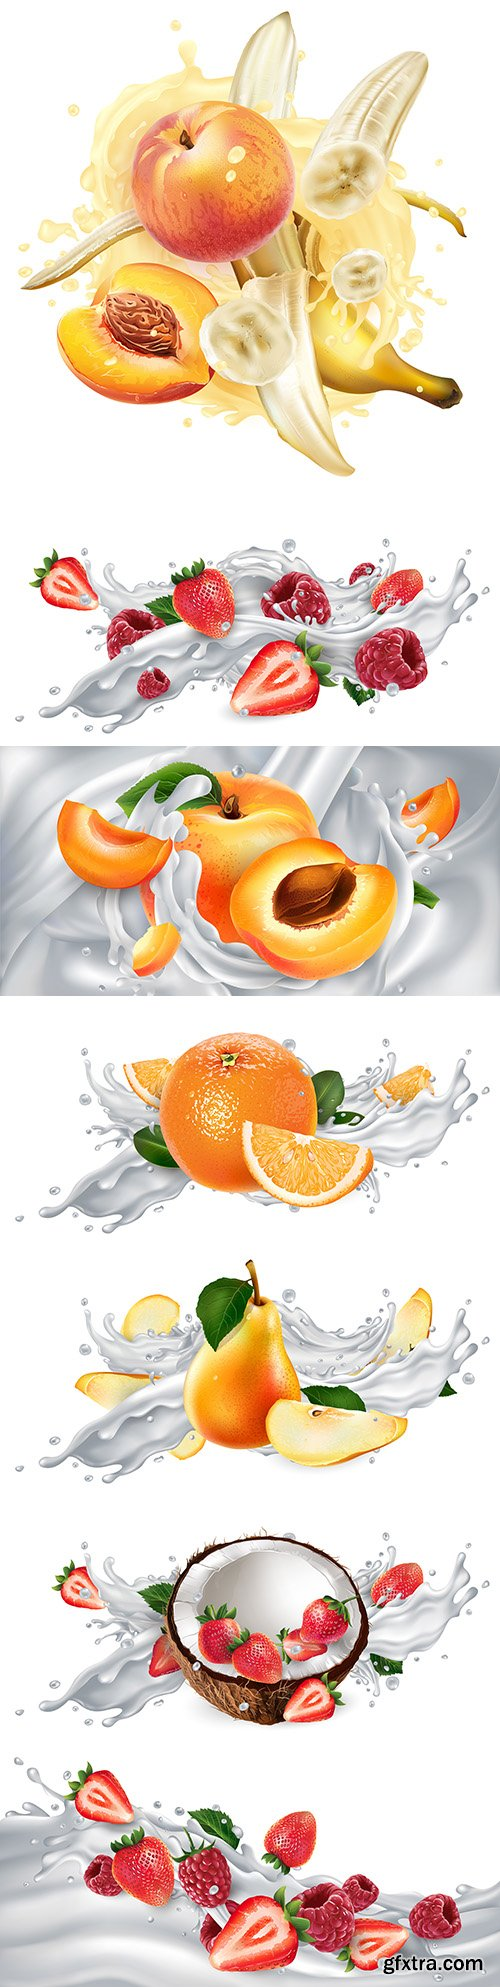 Ripe fruit and berries in splash of milk or yogurt